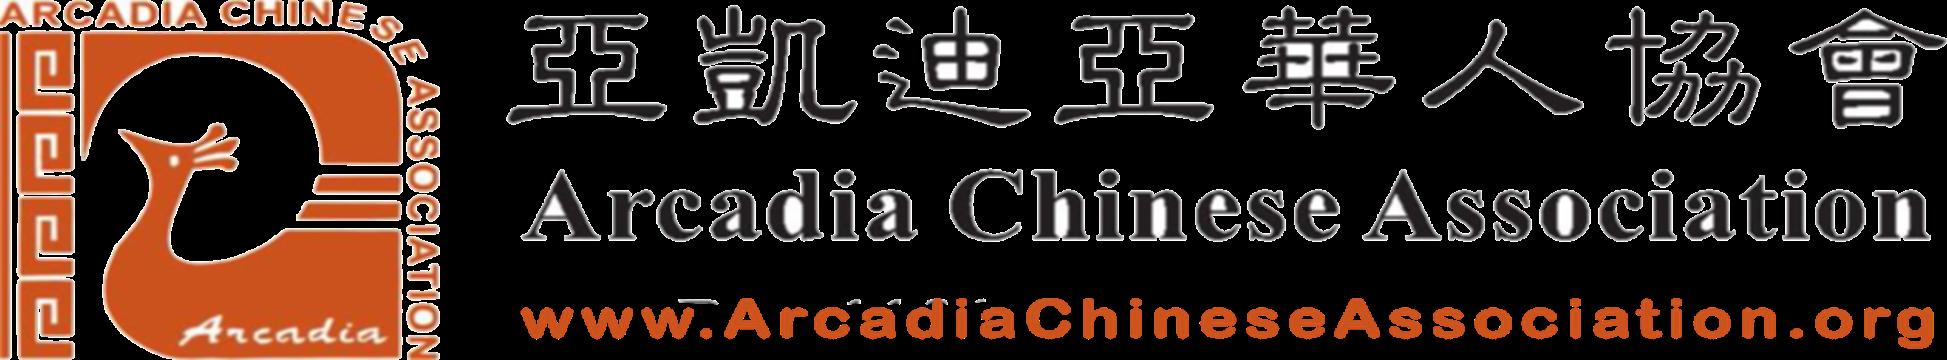 Chinese Association logo